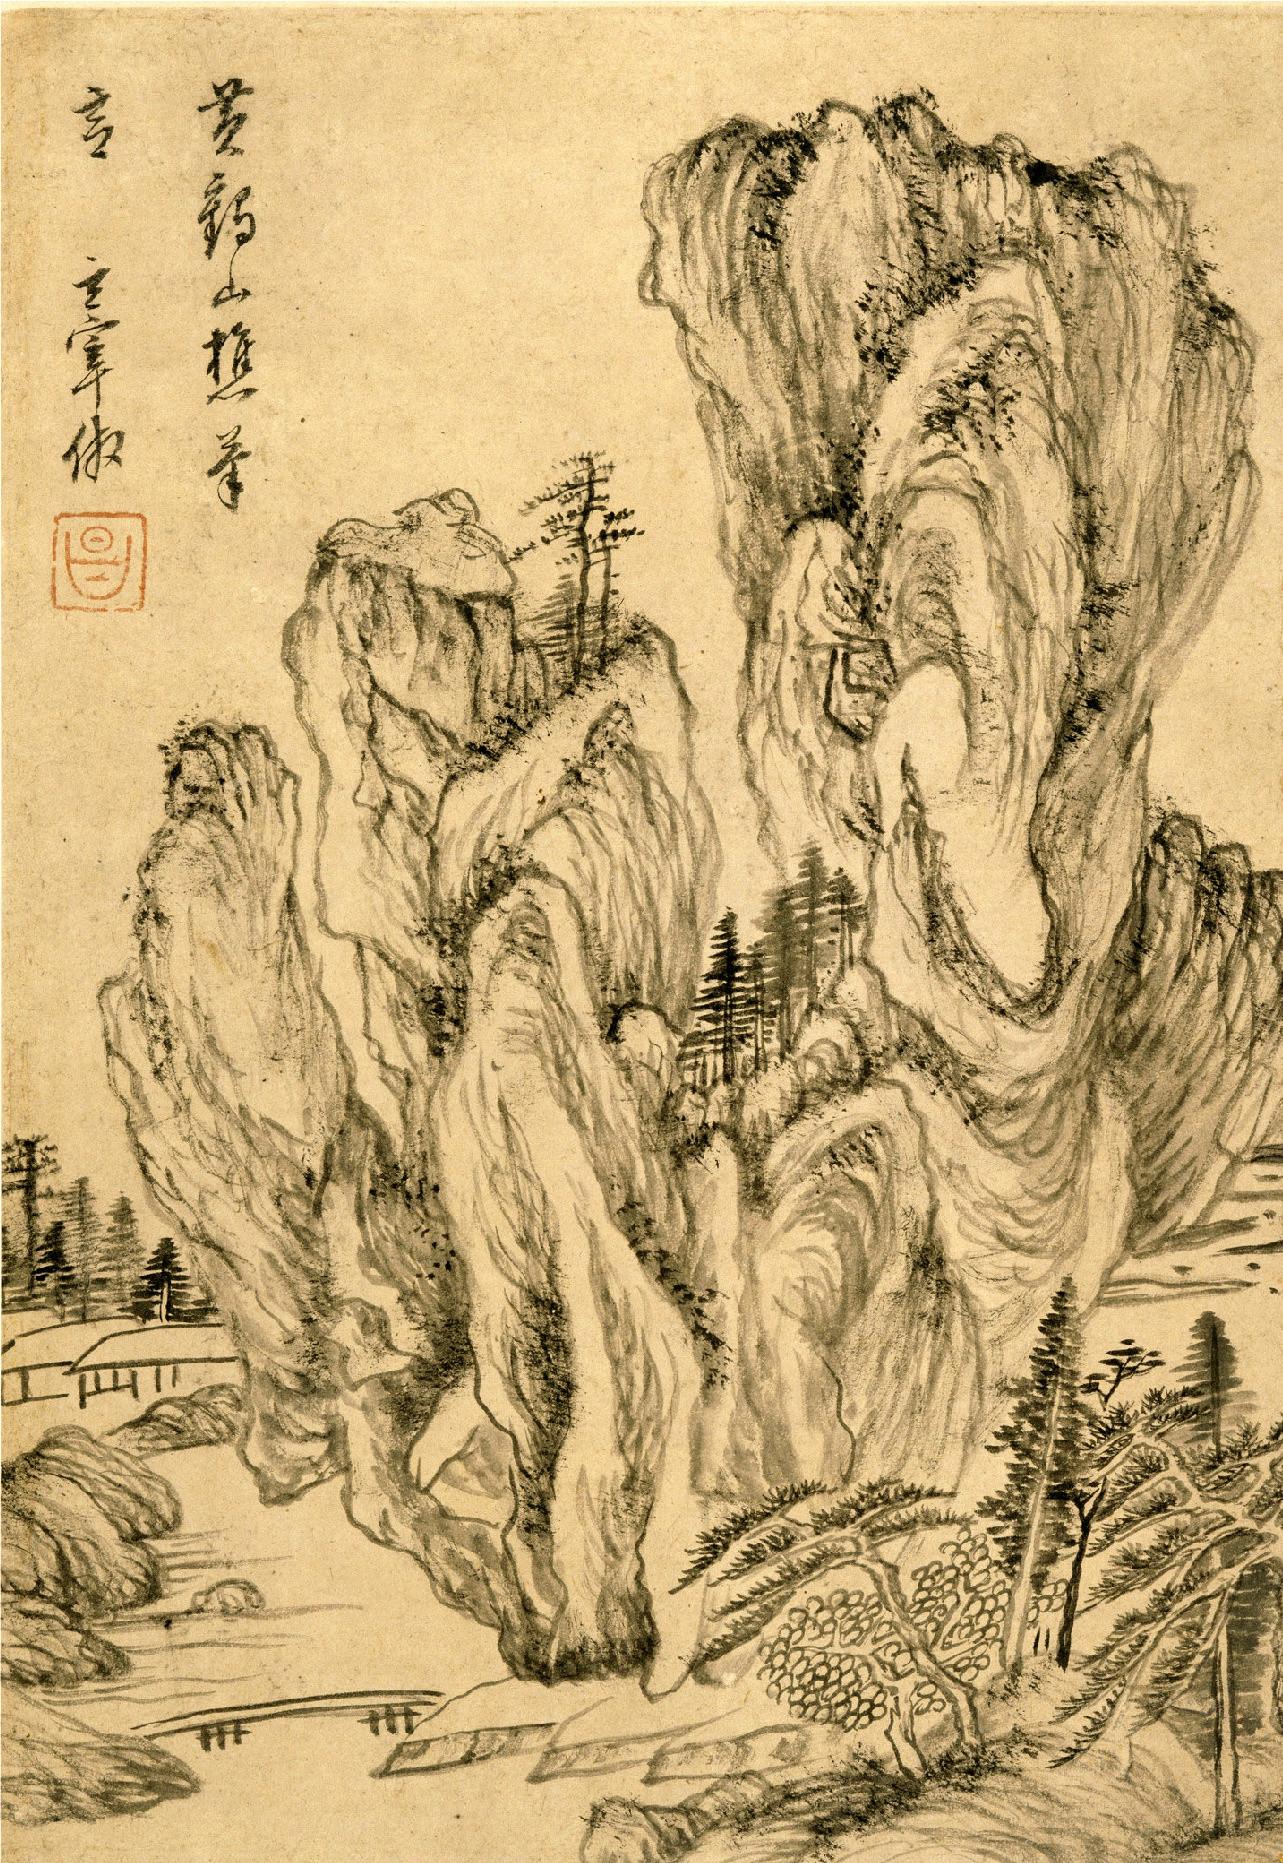 Dong Qichang,